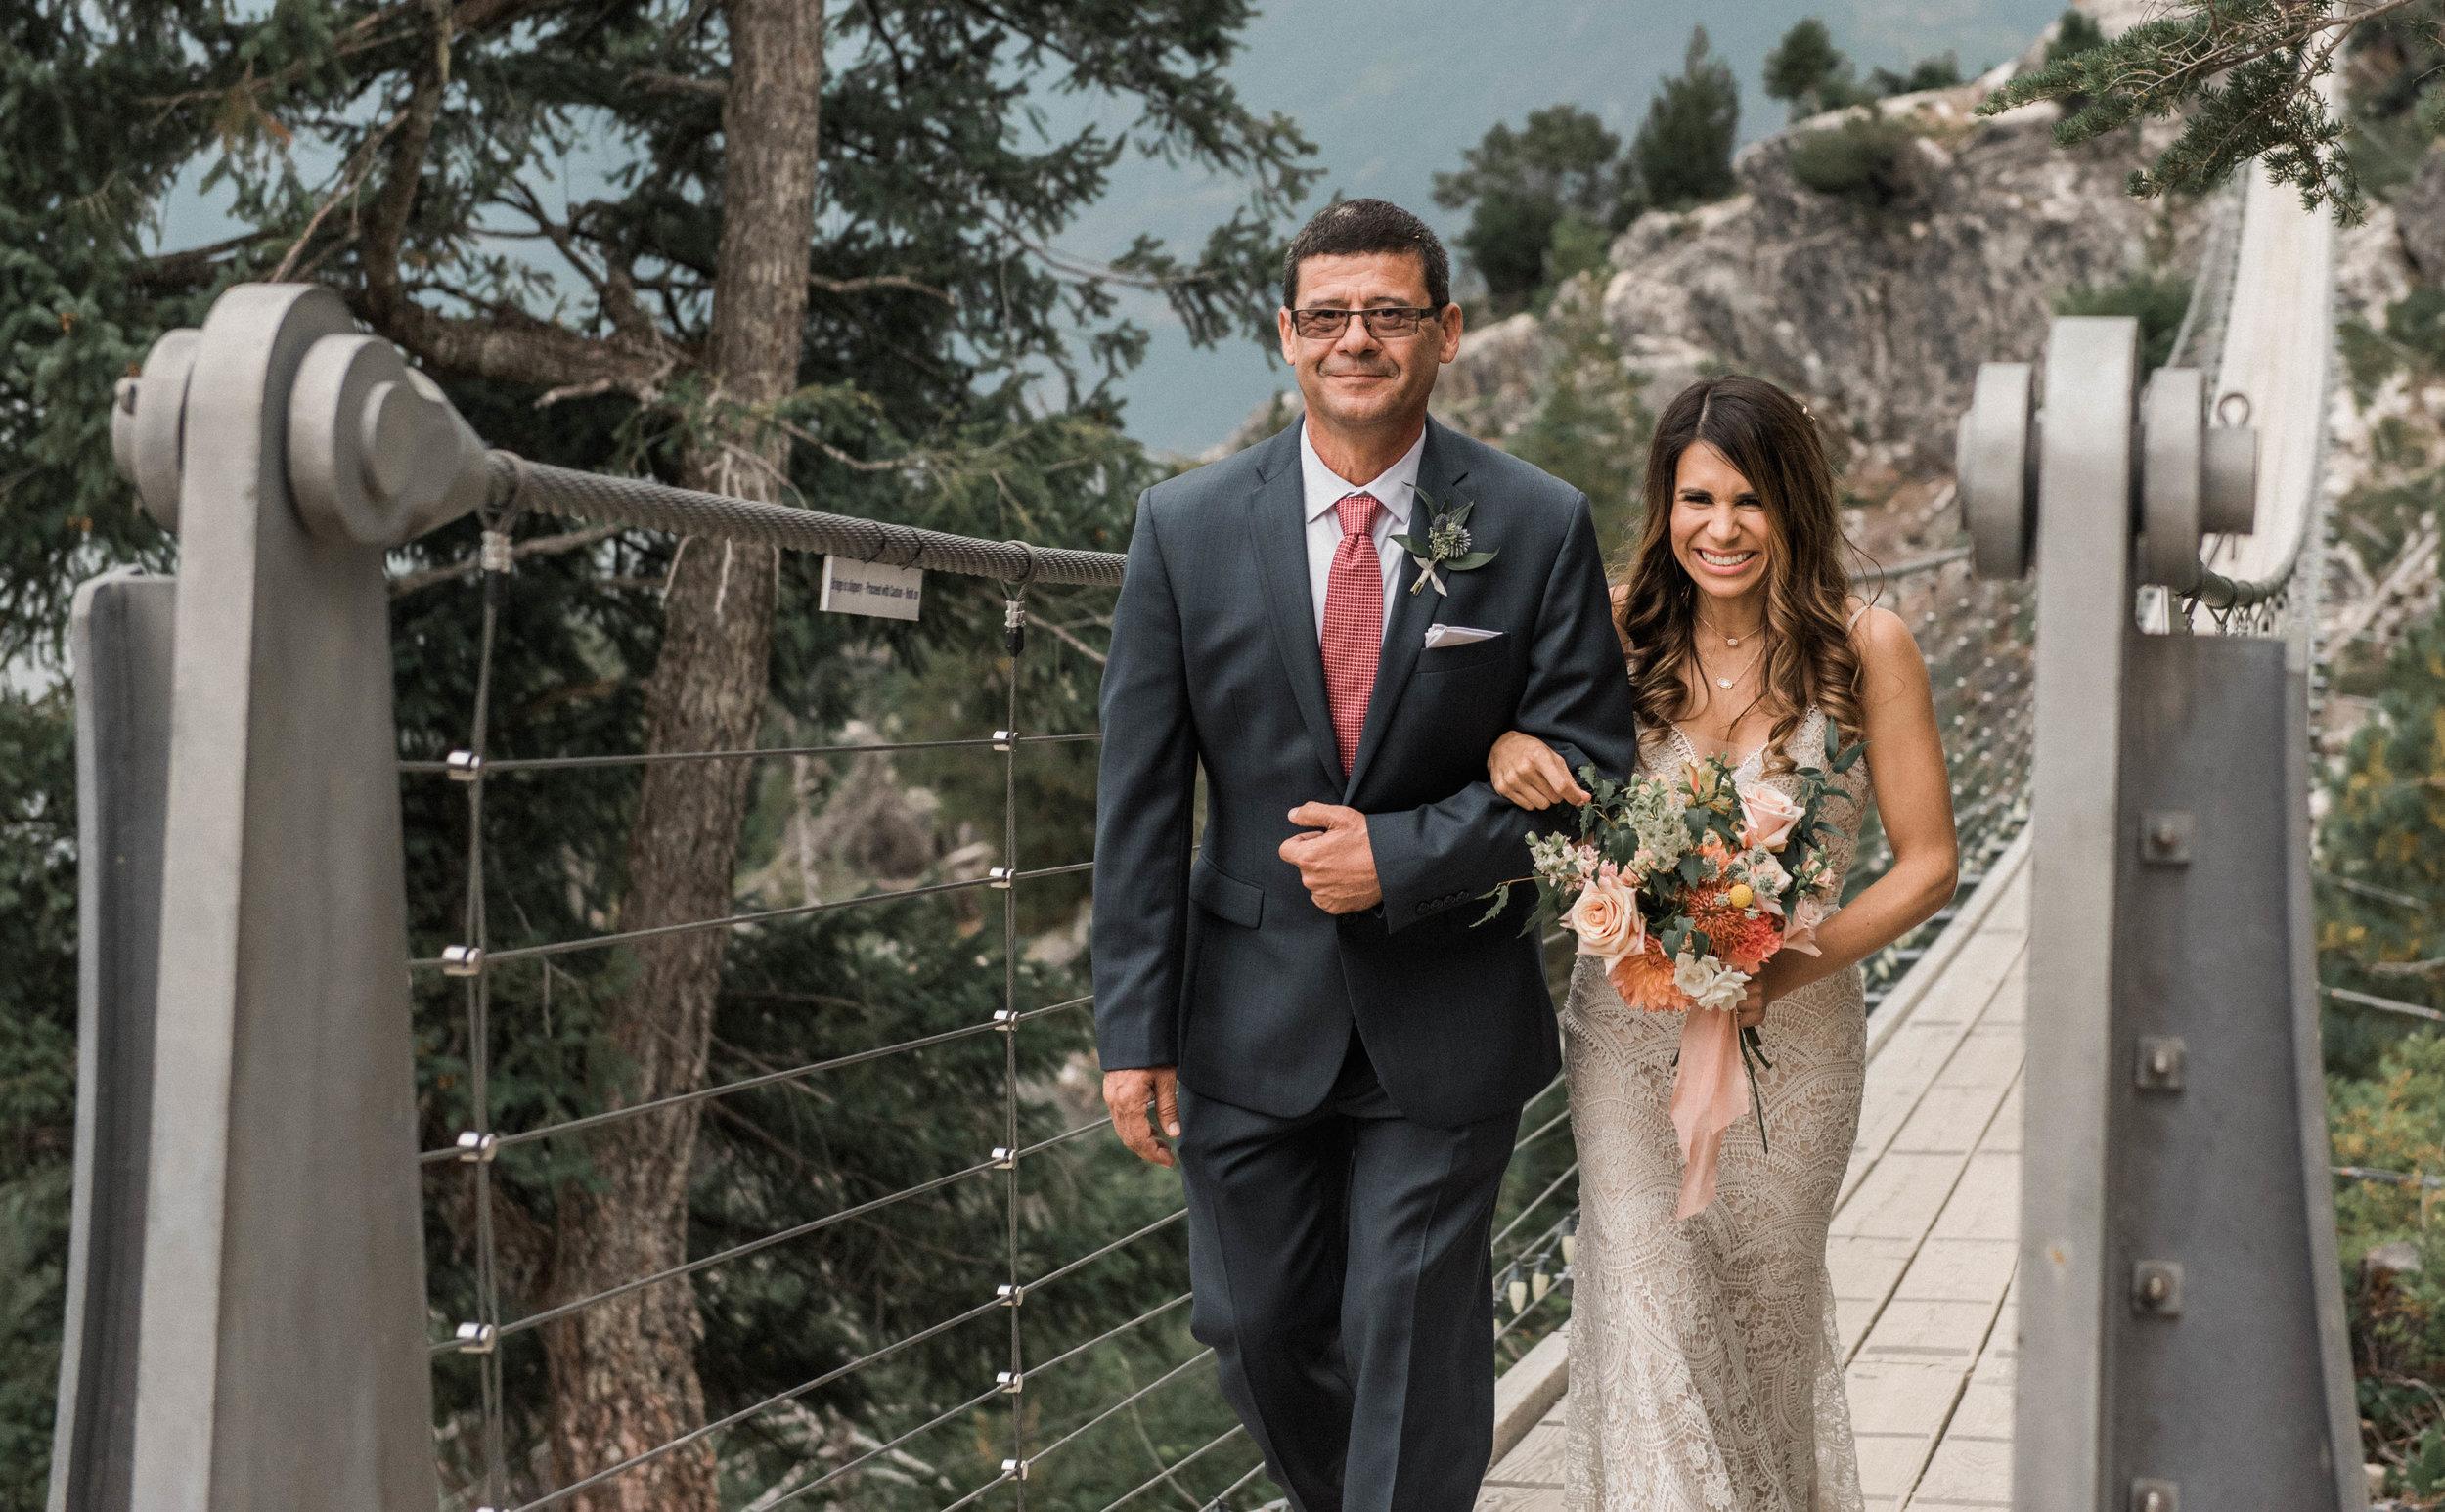 austin-texas-wedding-photography-1778-photographie-81.jpg